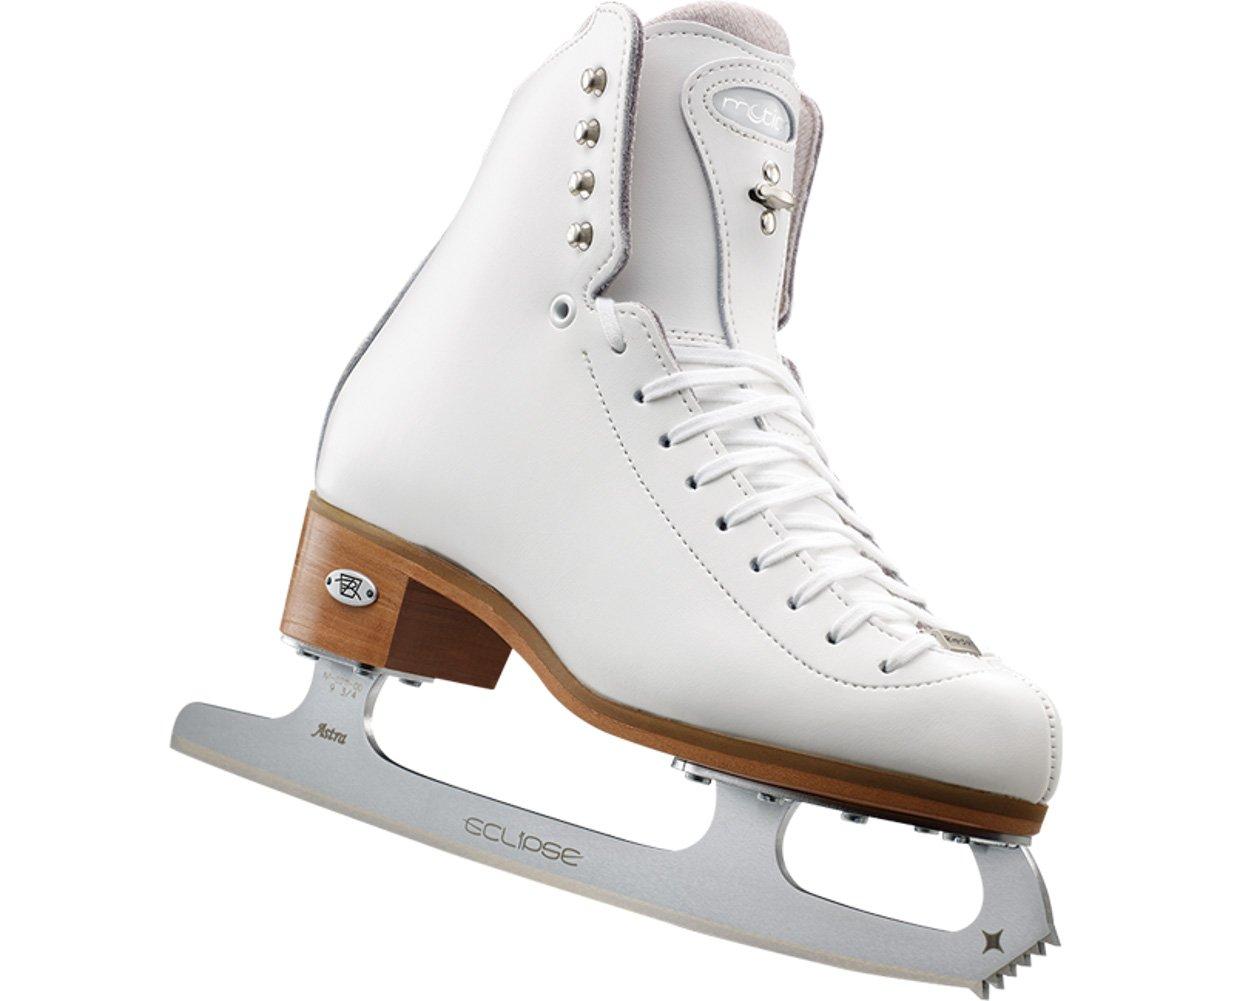 Riedell 25 Motion - White Girls Figure Skate Wide 3.5